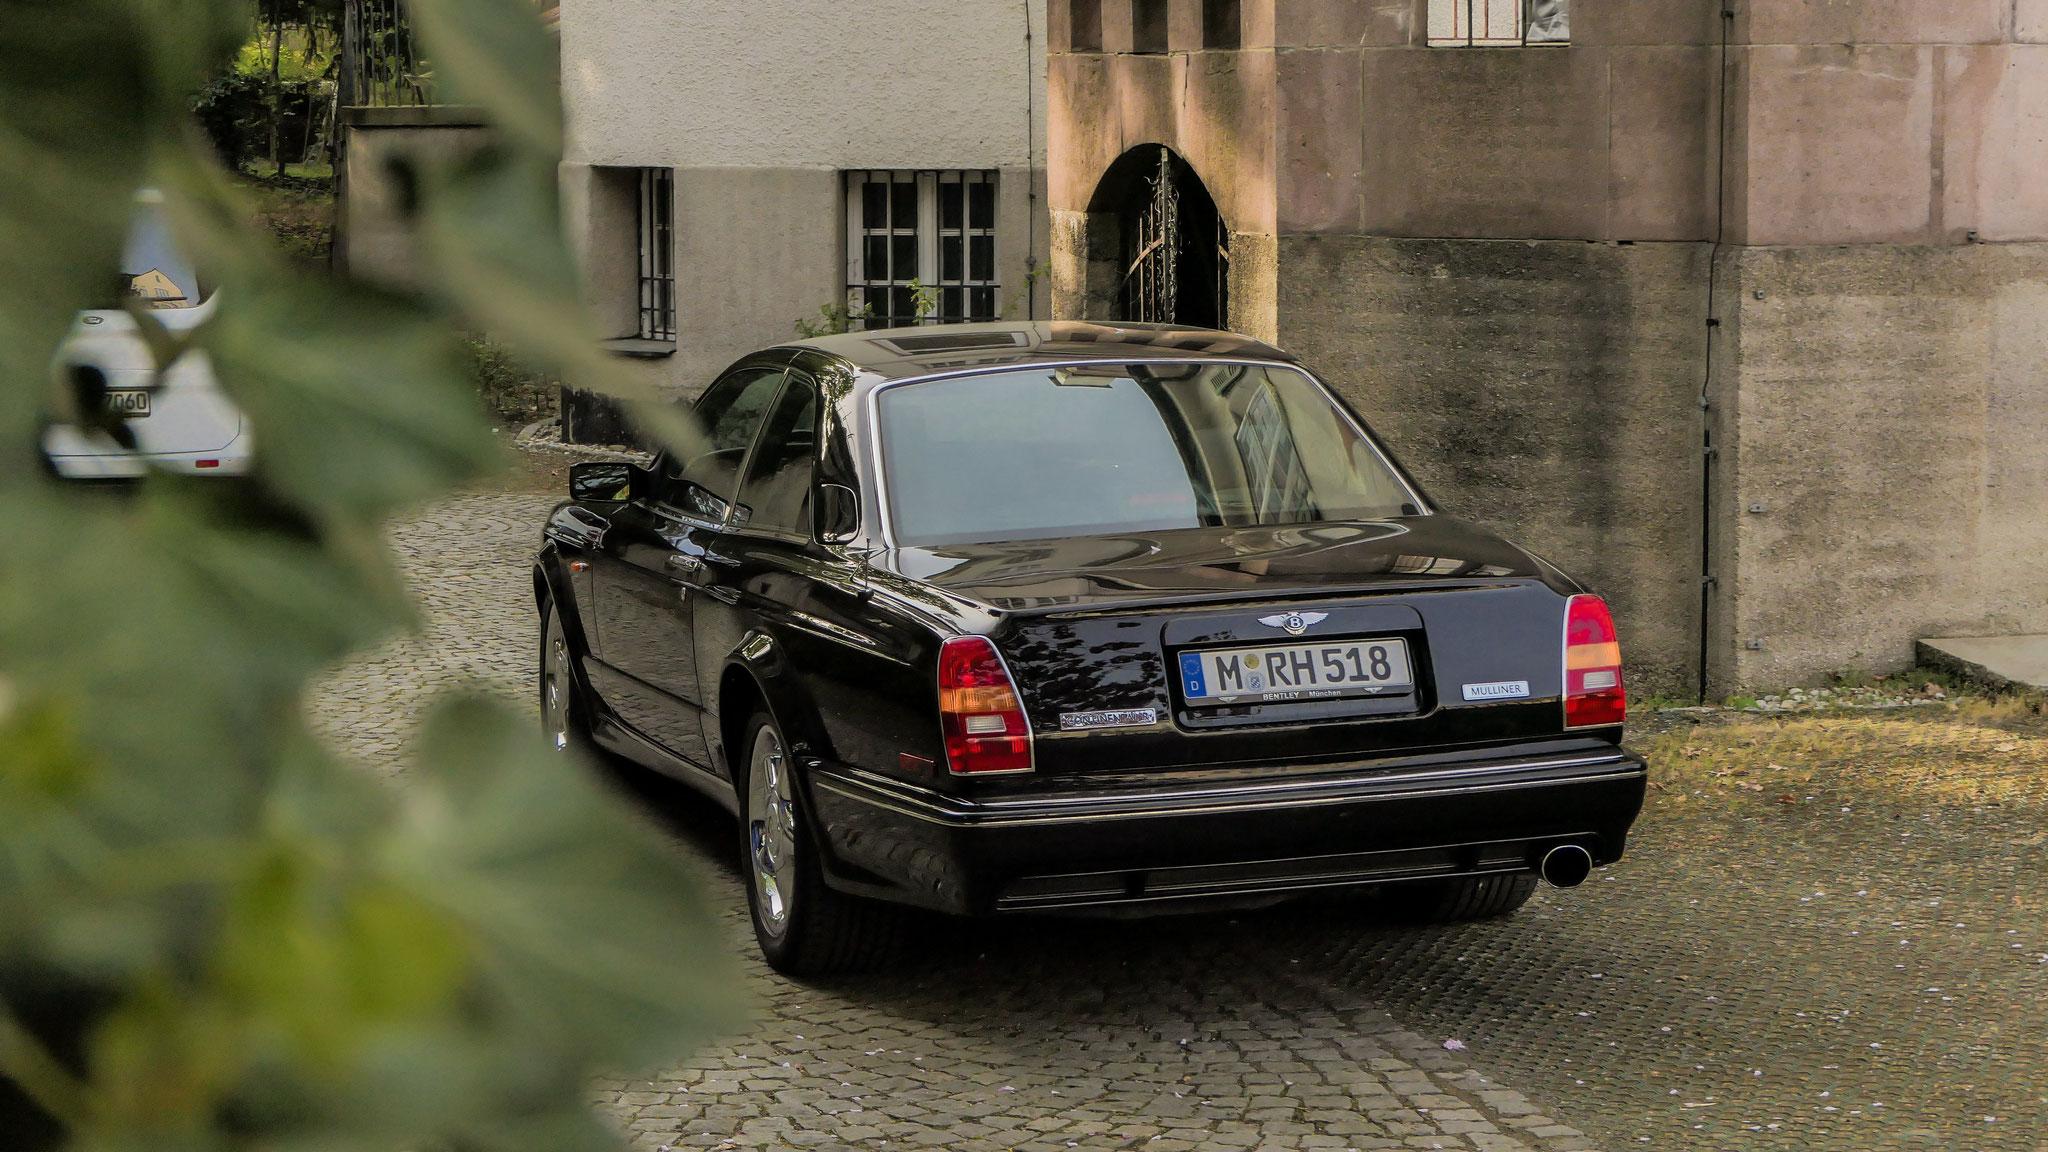 Bentley Continental R - M-RH-518